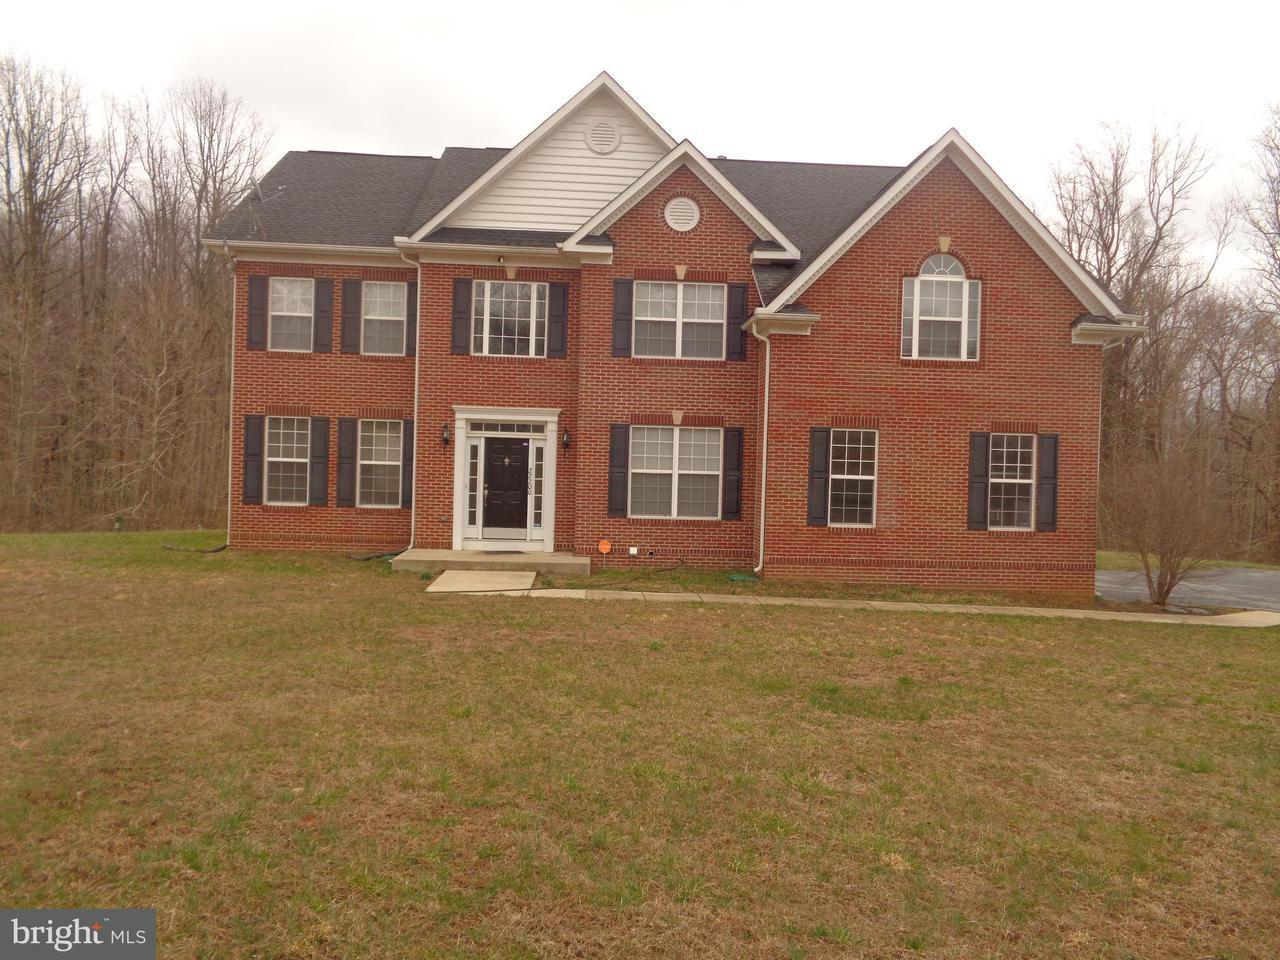 Farm for Sale at 22200 Garretts Chance Ct S 22200 Garretts Chance Ct S Aquasco, Maryland 20608 United States